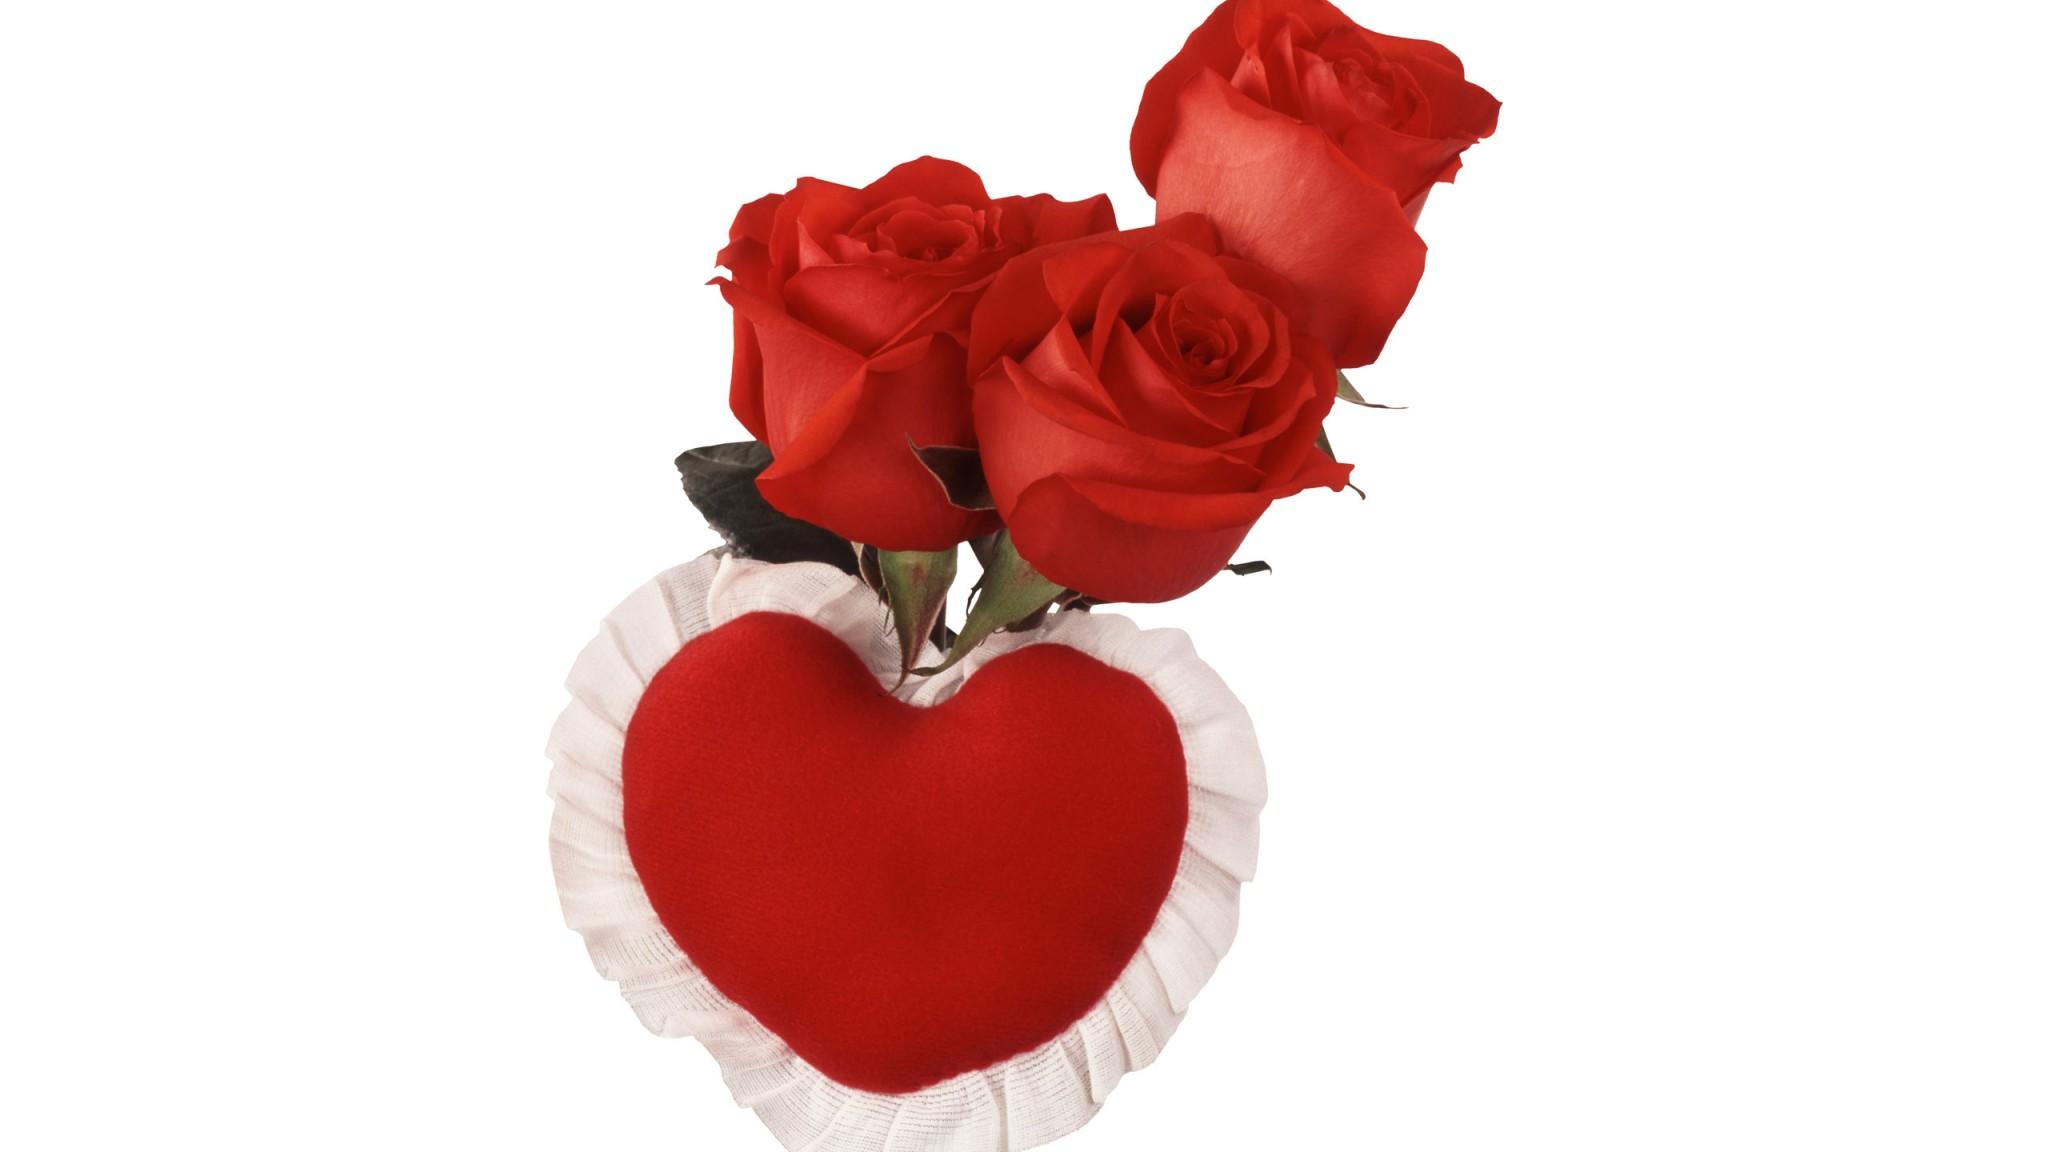 Rose Heart  February 14  Darling Honey Sweet Lovers  Holiday HD Wallpaper